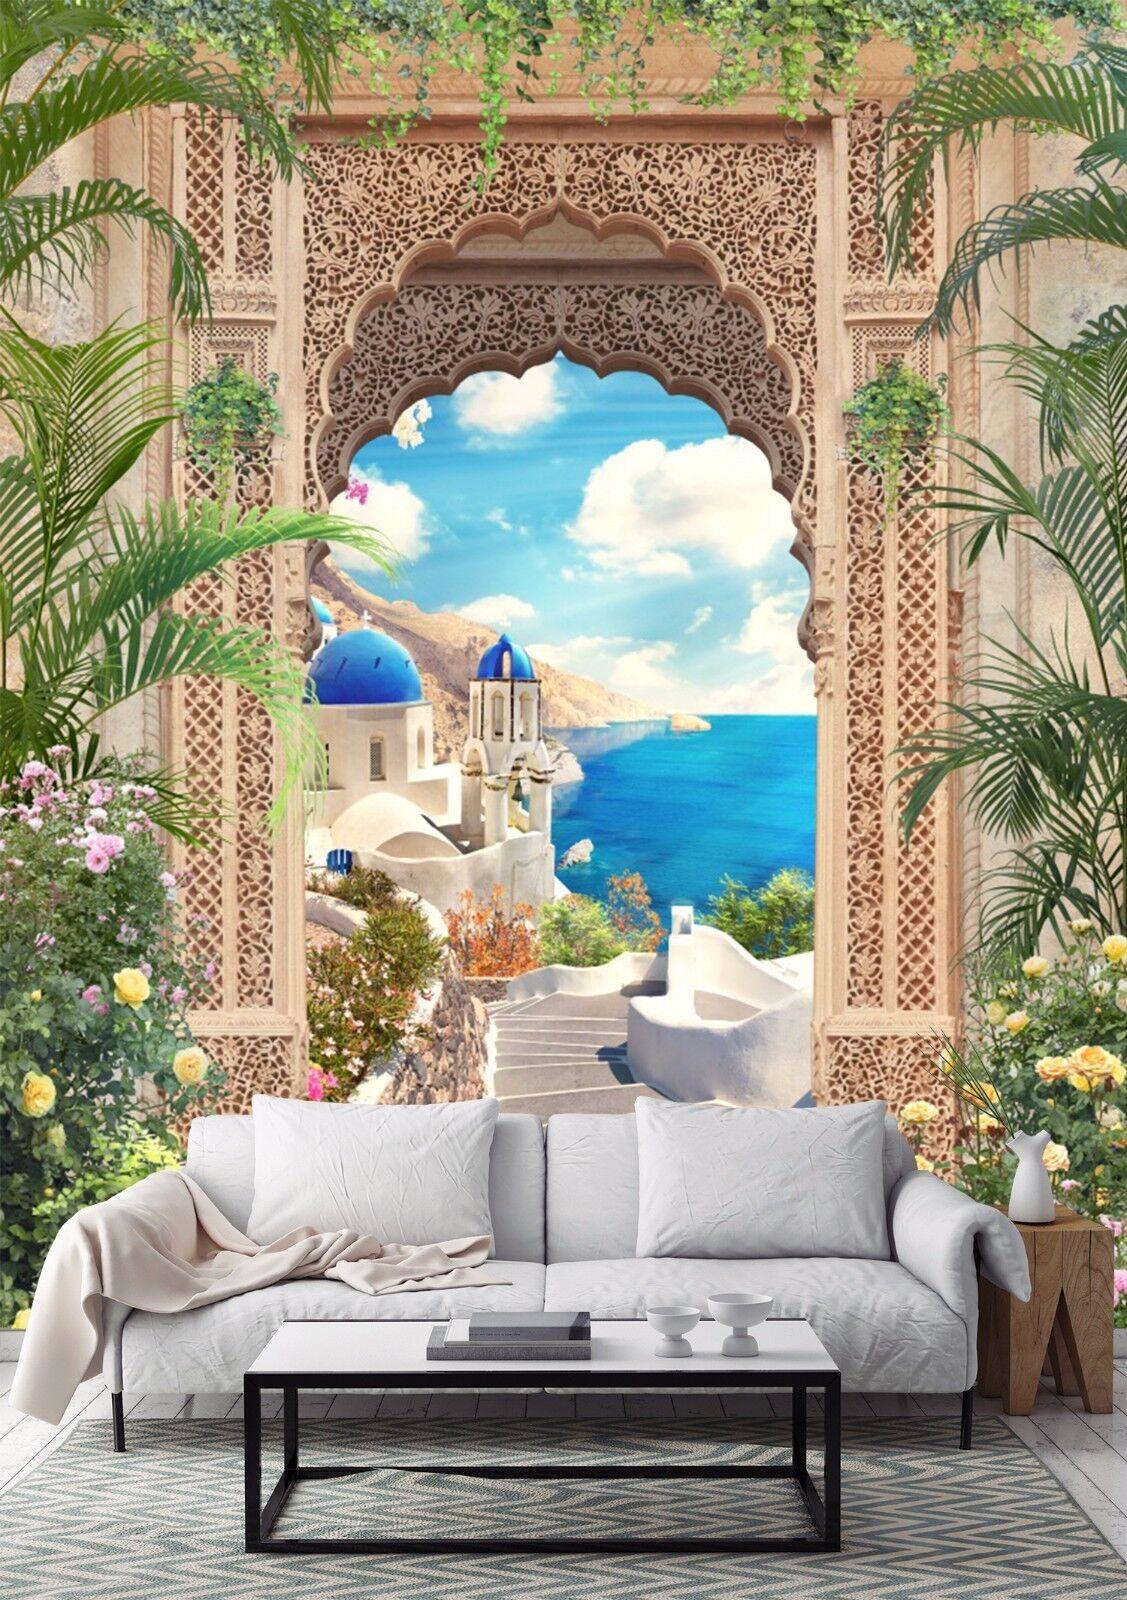 3D Aegean Sea Blau tree Wall Paper wall Print Decal Wall Deco Indoor wall Mural